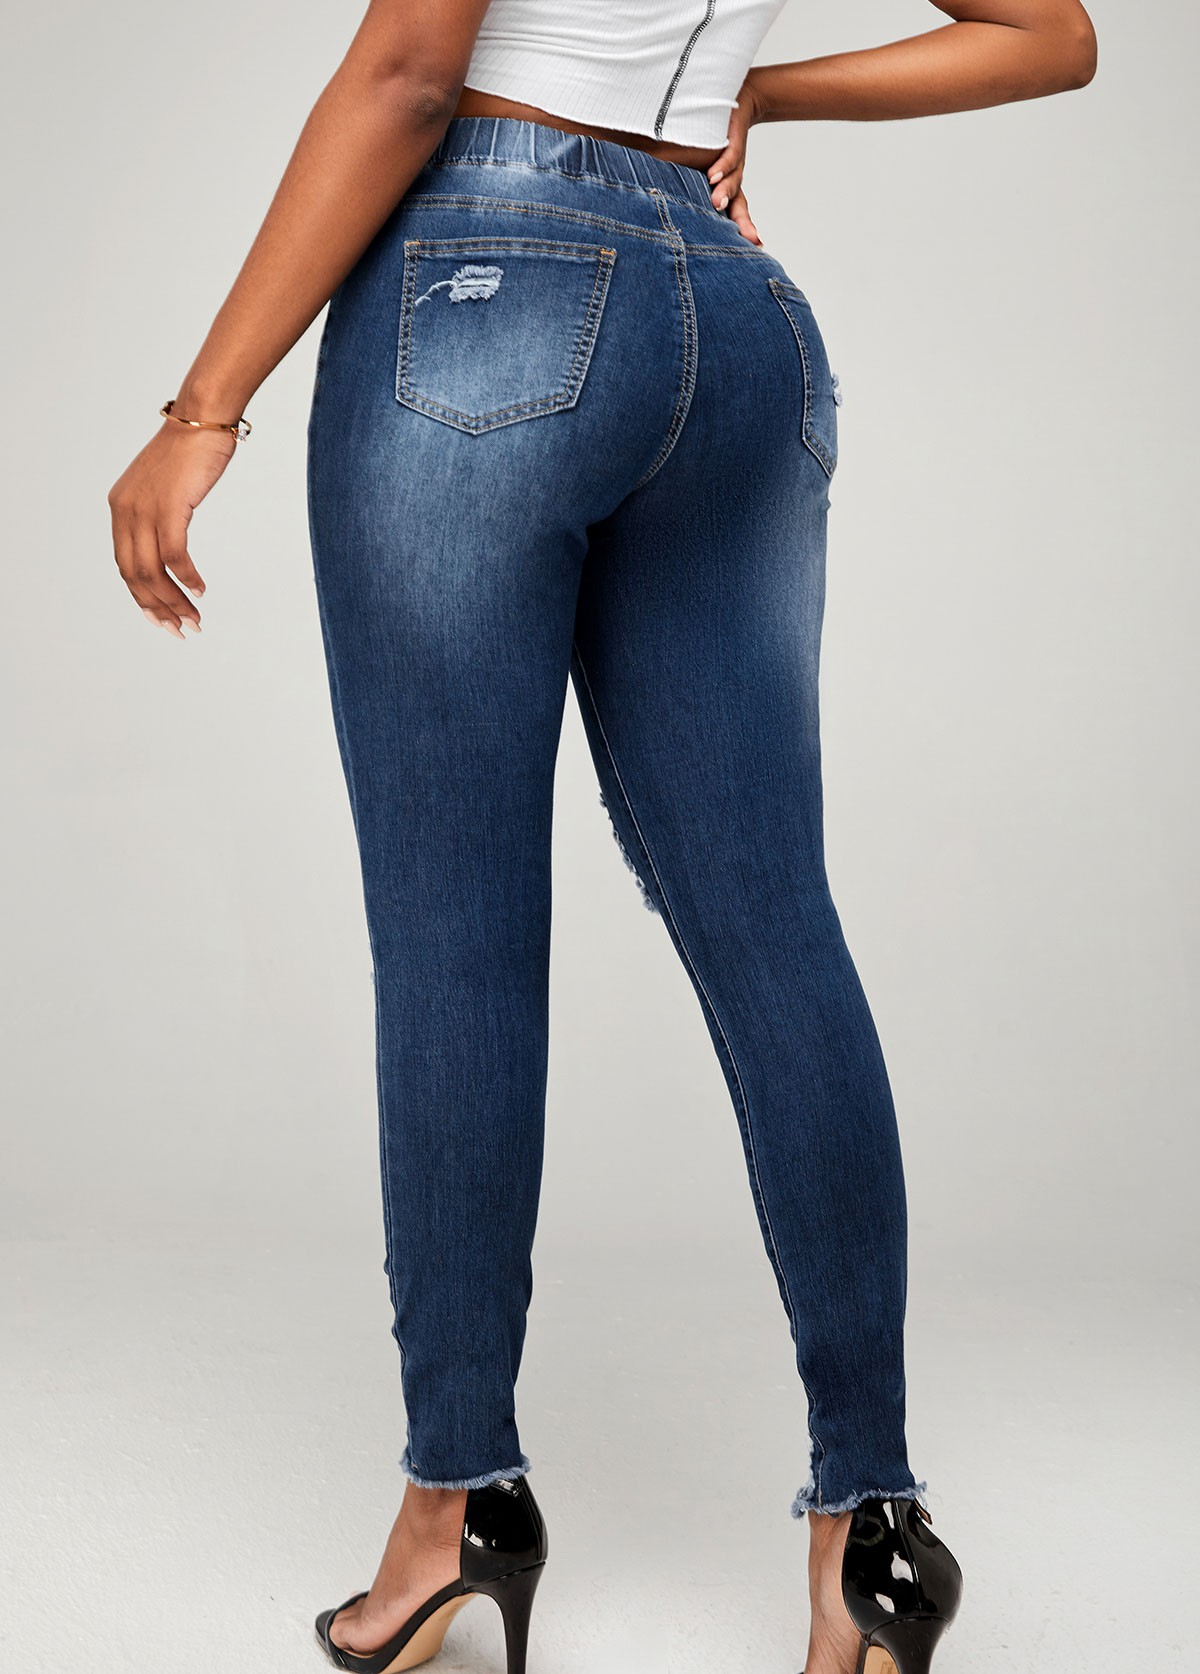 Drawstring Detail Shredded Skinny Mid Waist Jeans